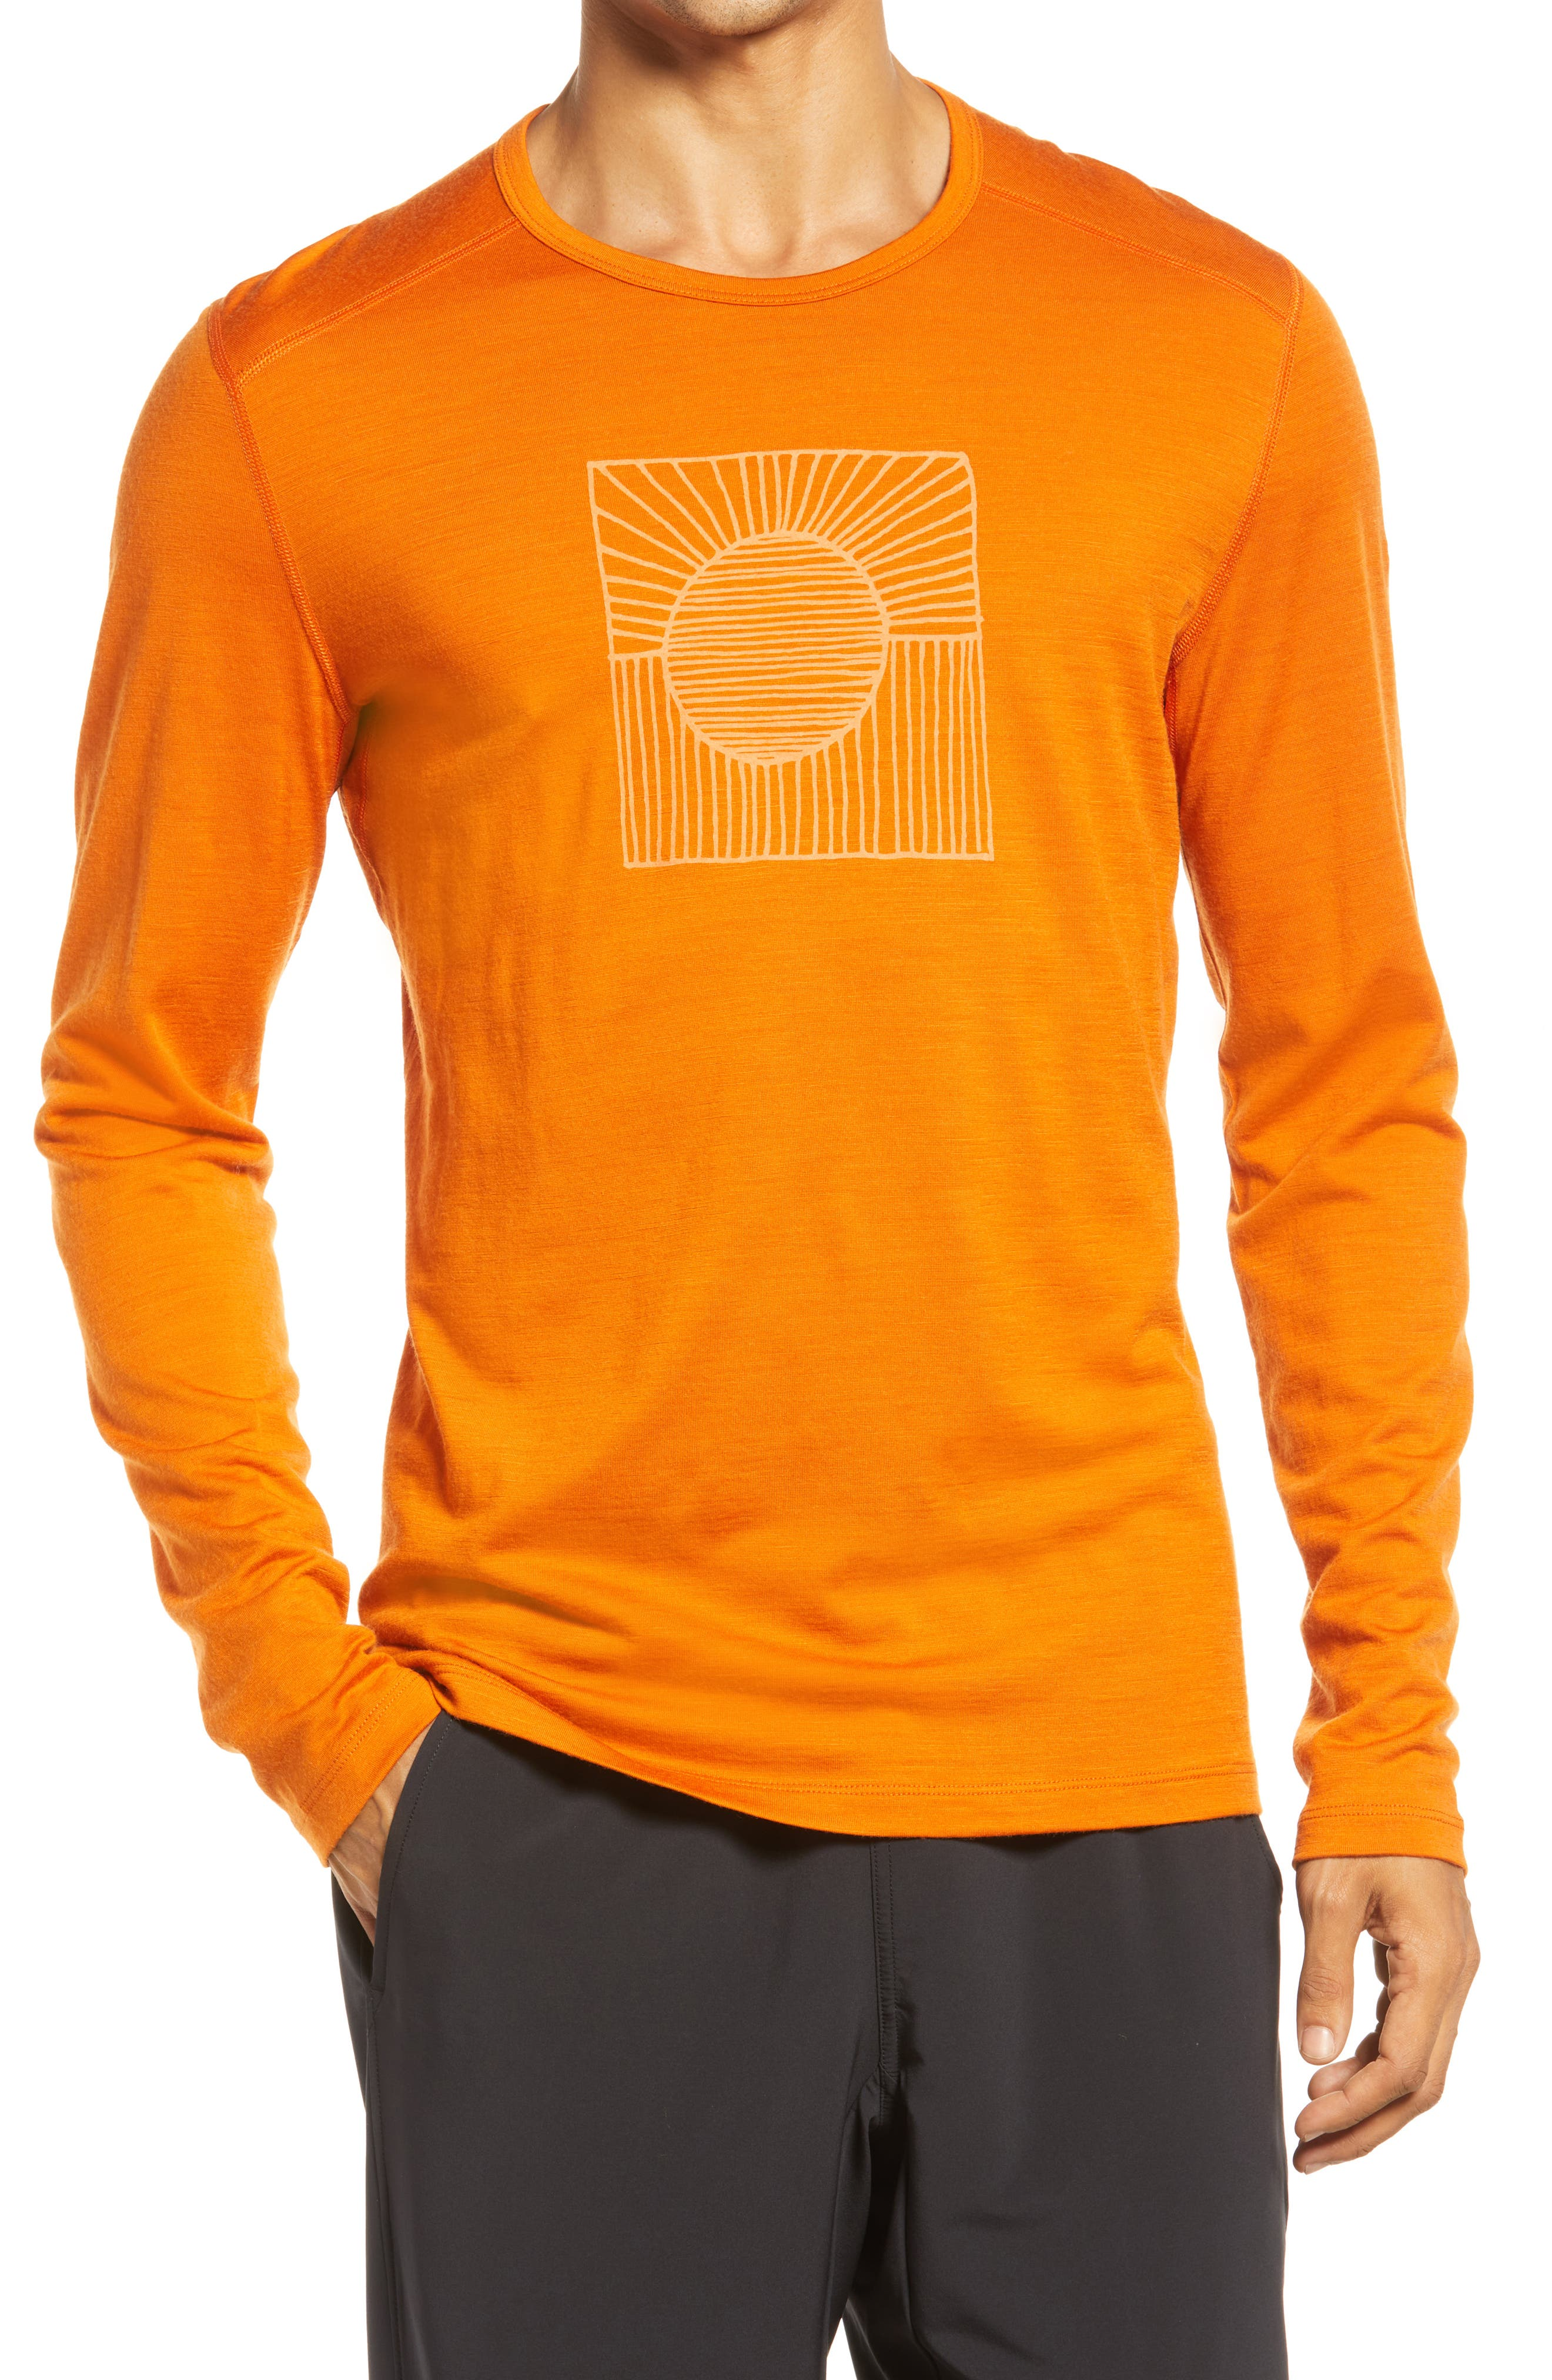 200 Oasis Long Sleeve Crewe Solar Merino Wool Graphic Tee